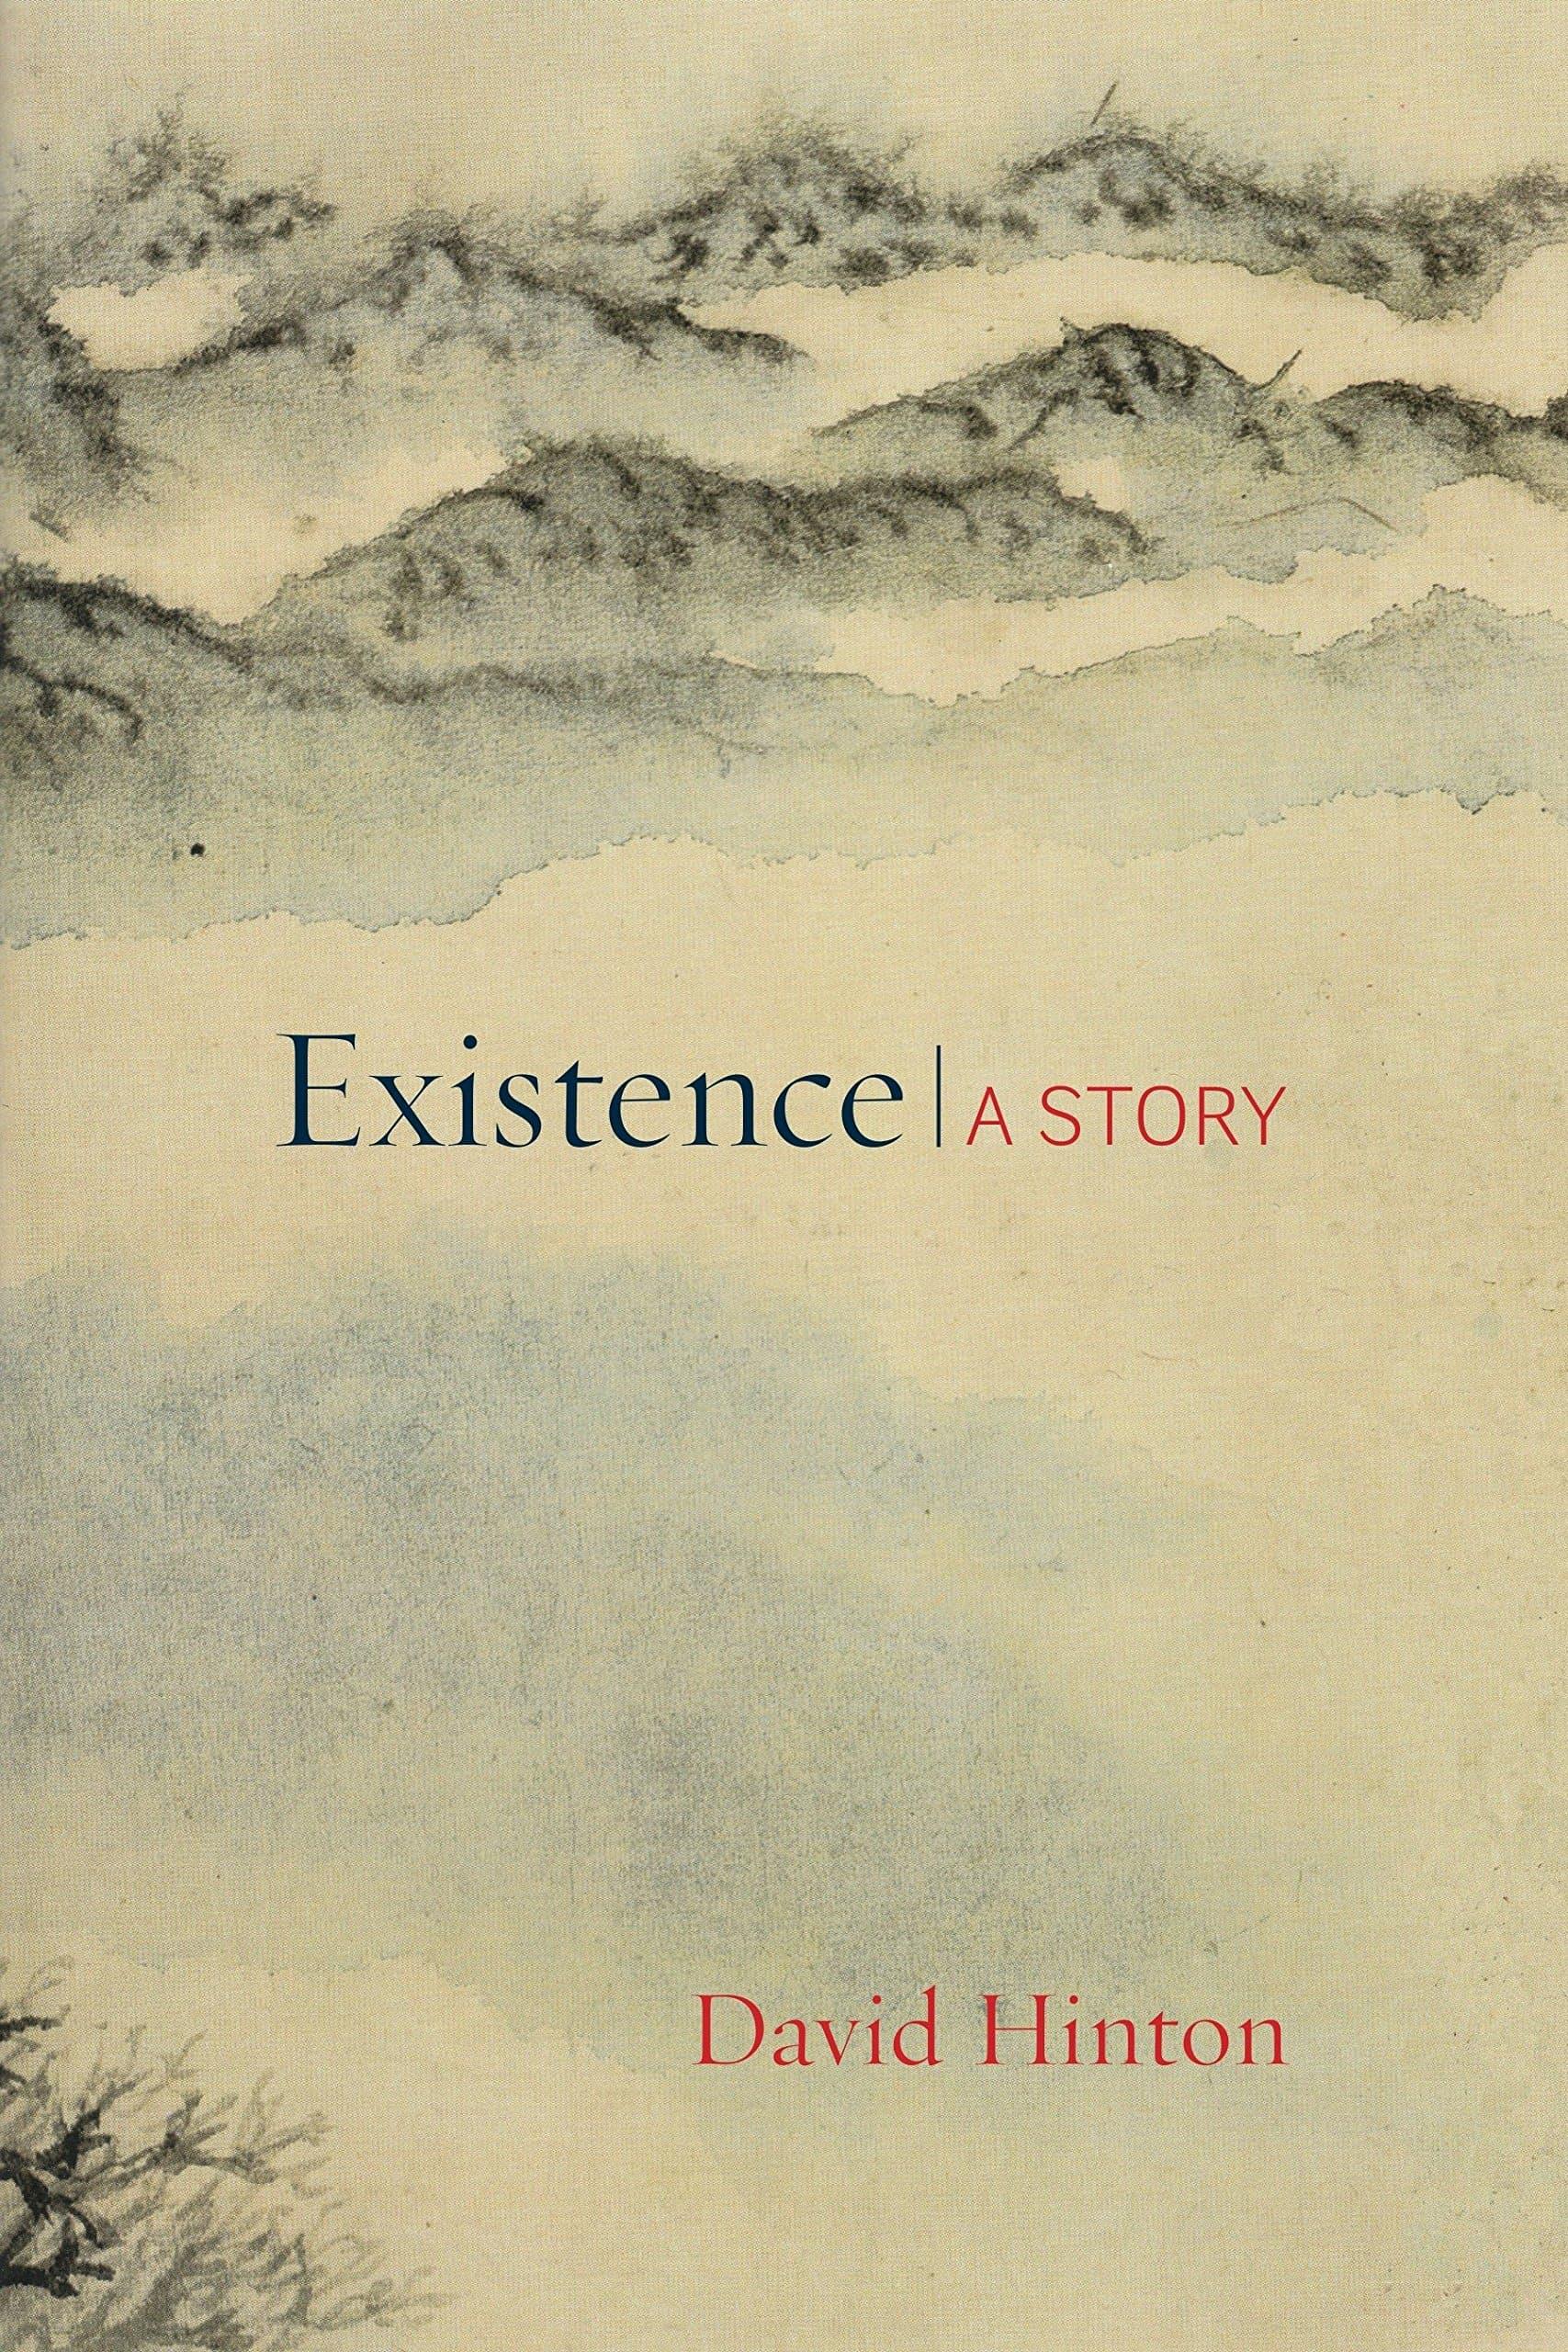 existence-a-story-david-hinton